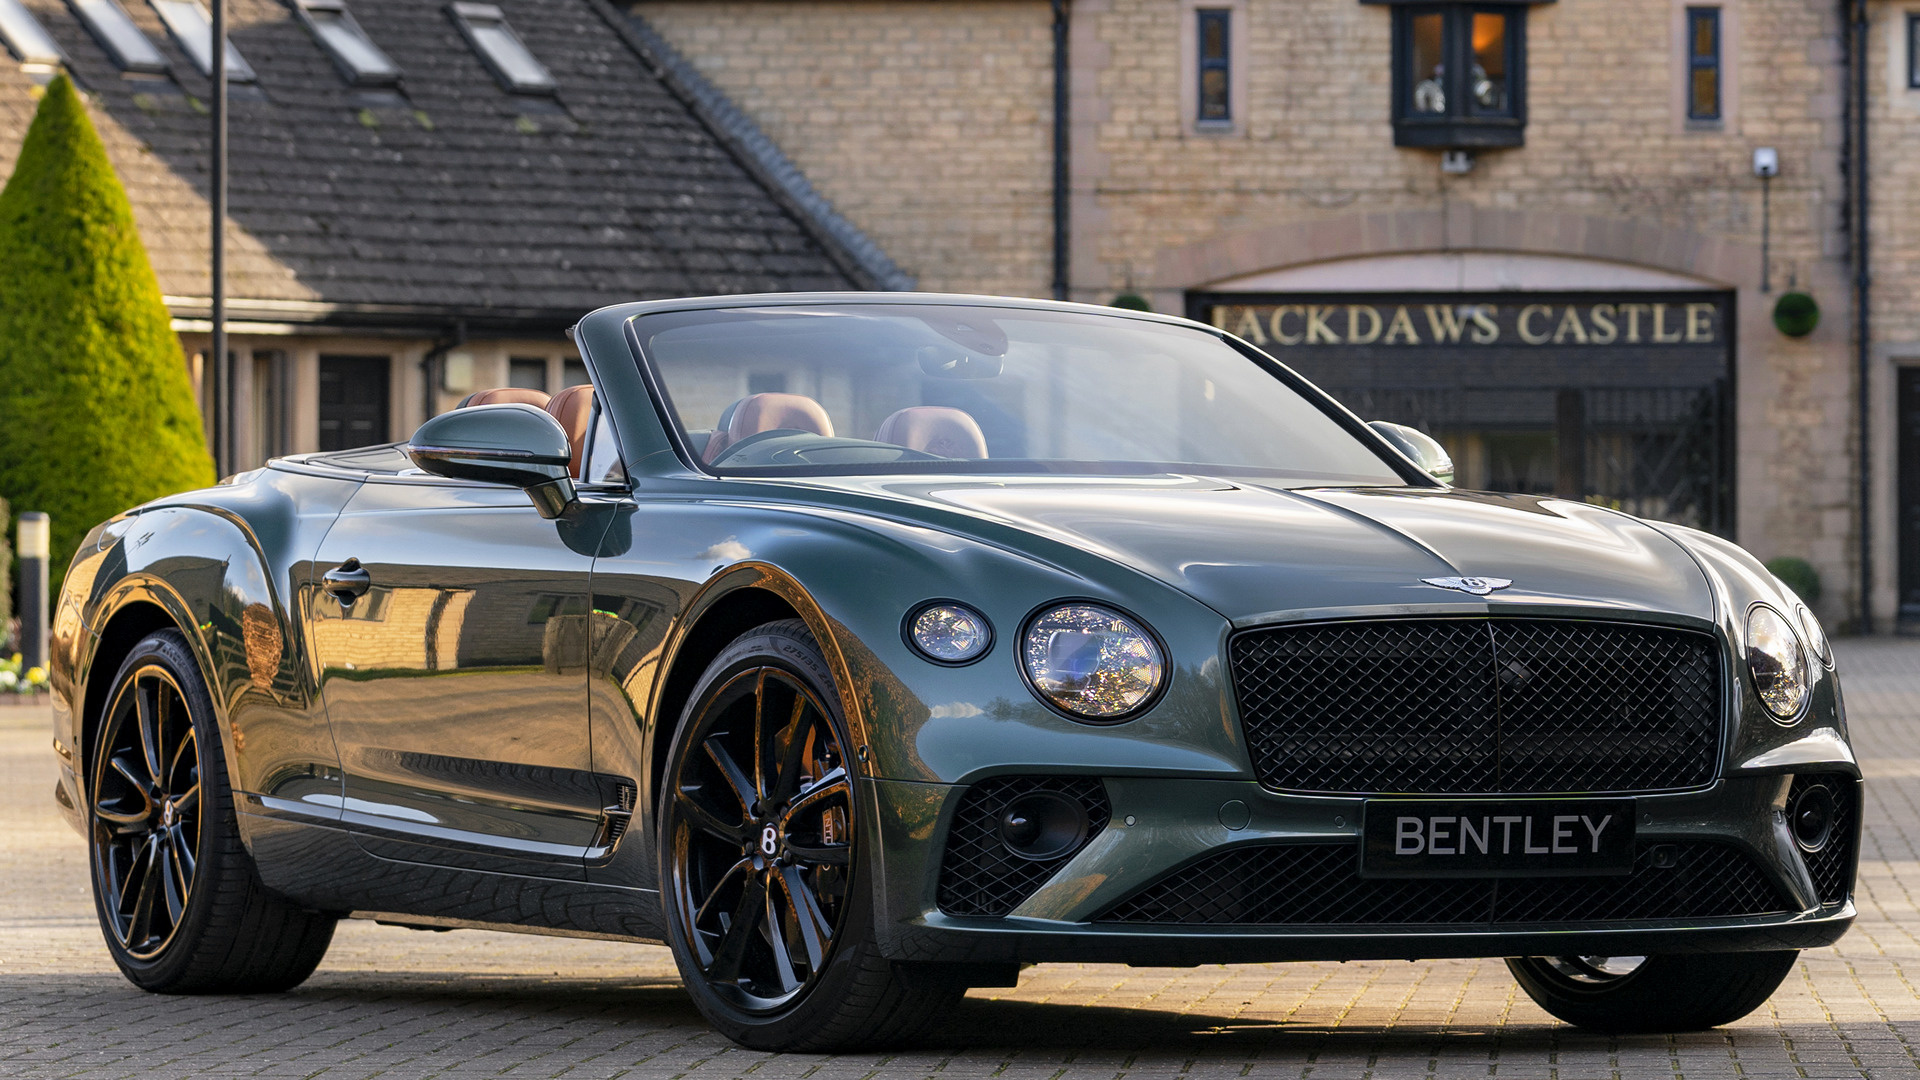 2020 Bentley Continental Gt Convertible Equestrian Edition By Mulliner Uk Papeis De Parede E Imagens De Fundo Em Hd Car Pixel